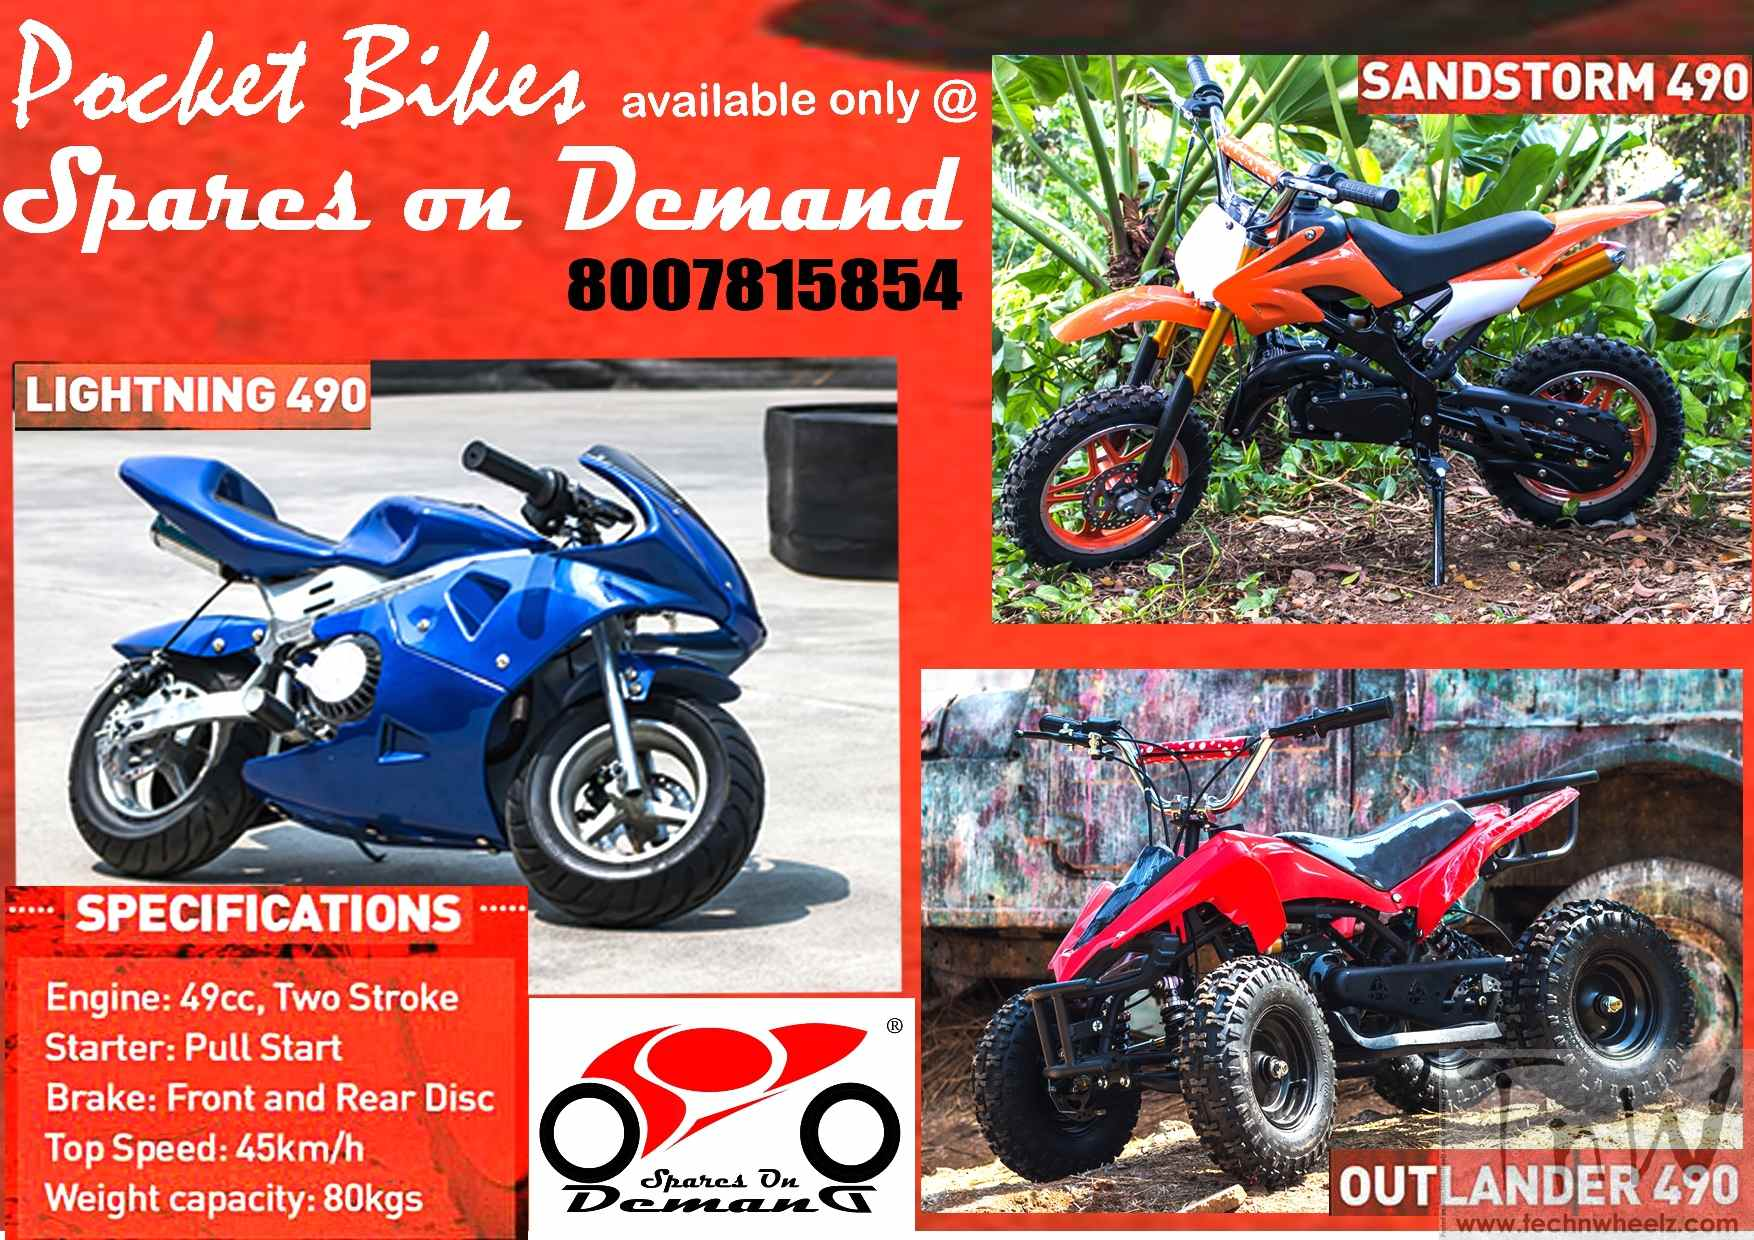 Headrush Pocket bikes now available in Pune – TECH 'N WHEELZ